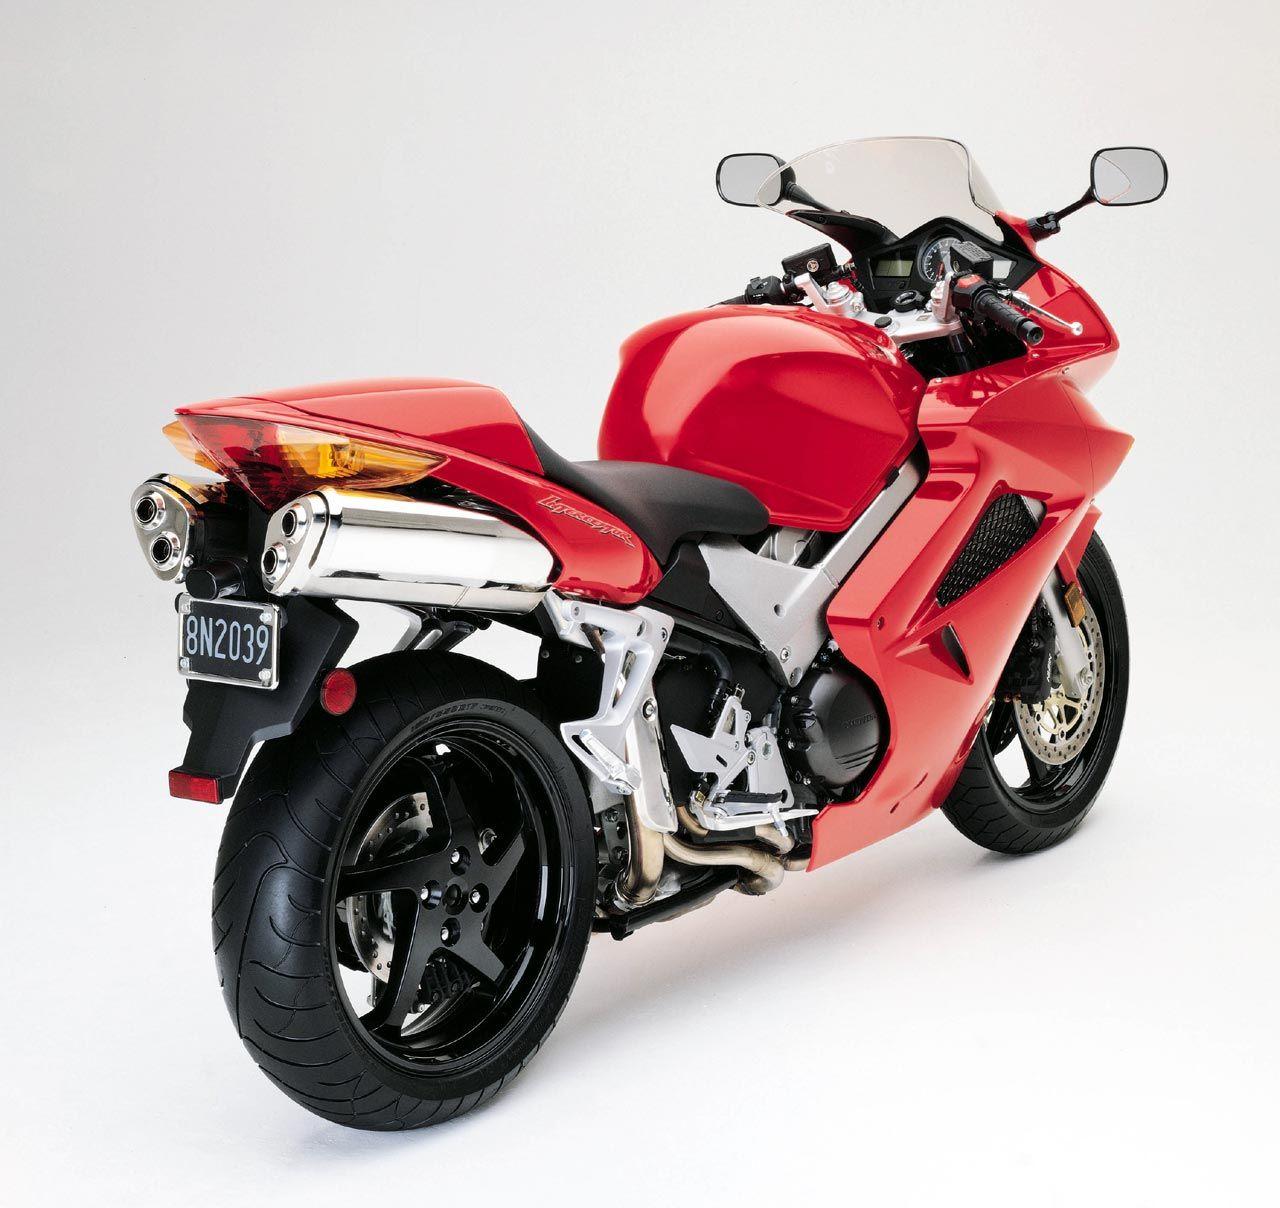 honda vfr 800   fotos de motos   pinterest   honda vfr, honda and